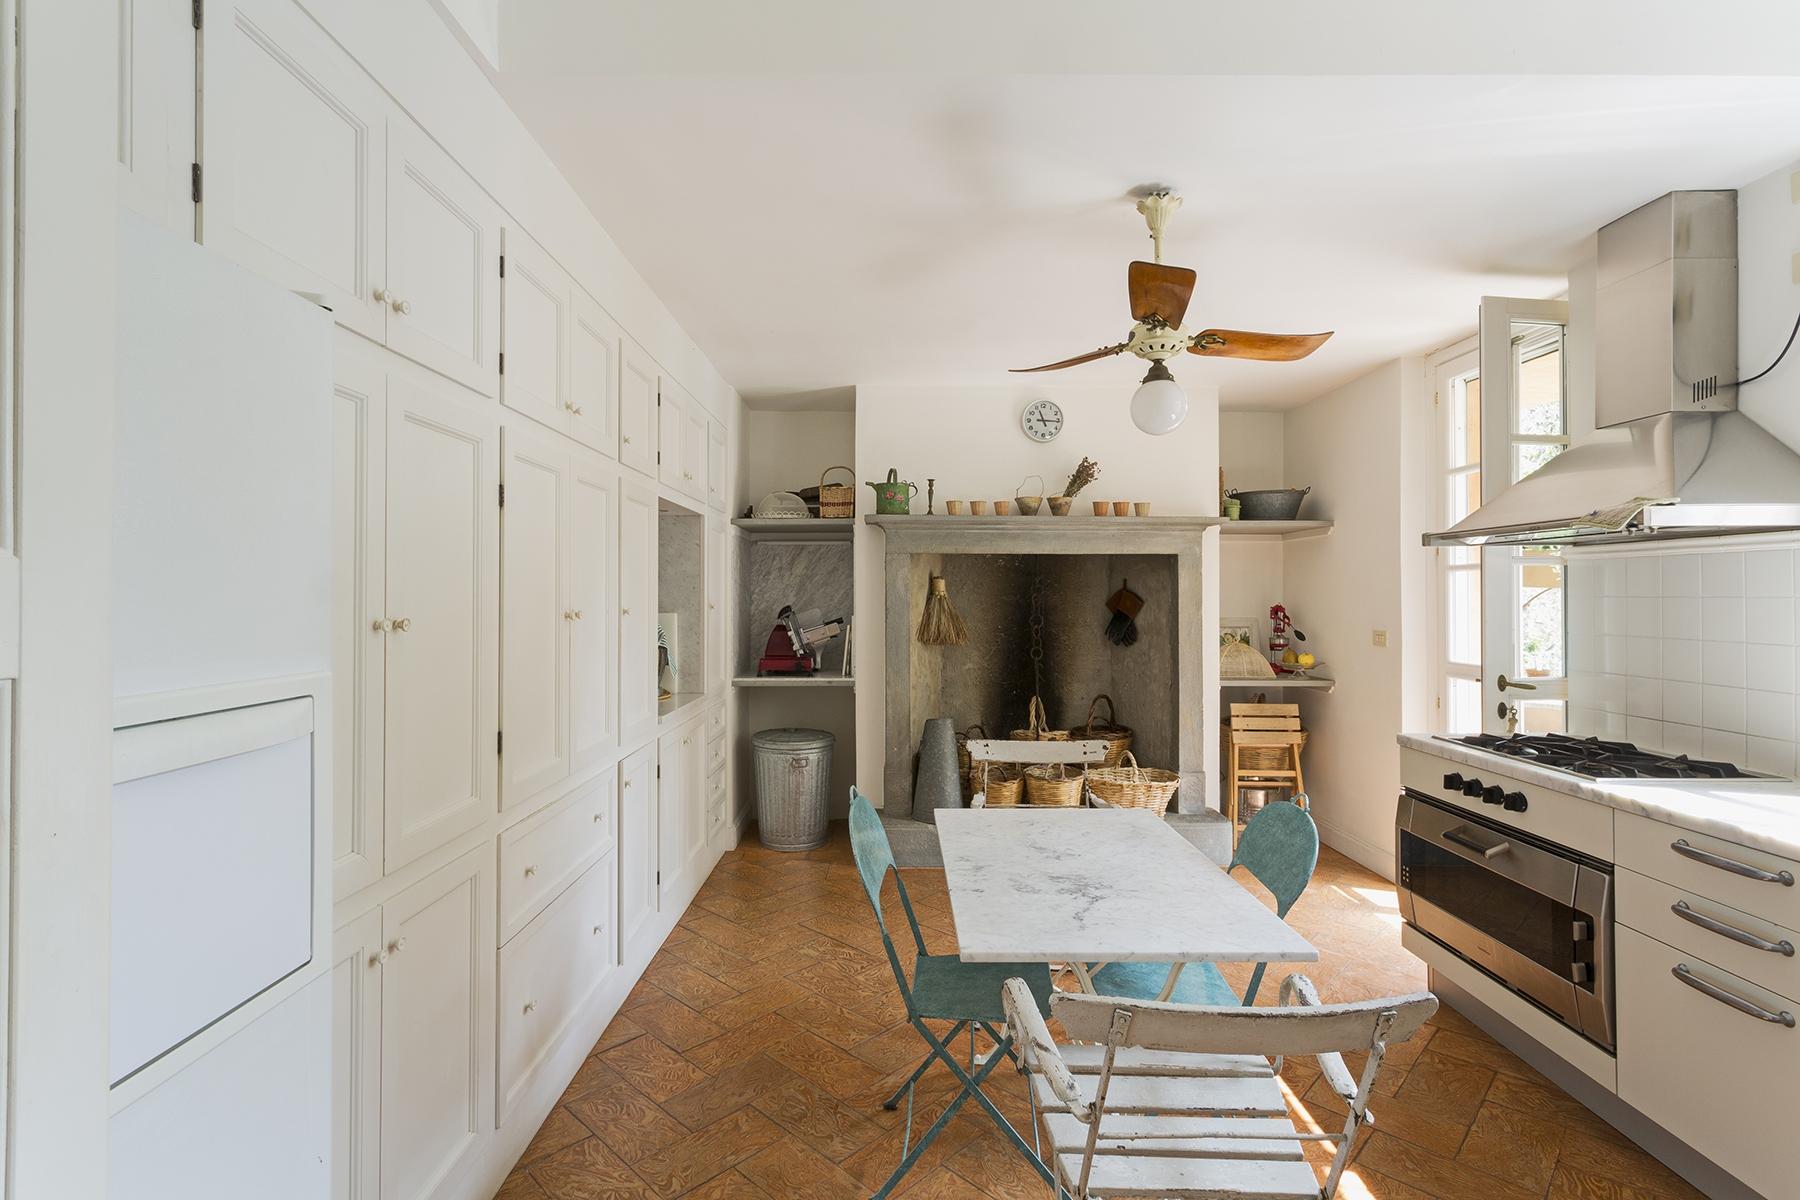 Villa in Vendita a Santa Margherita Ligure: 5 locali, 580 mq - Foto 18